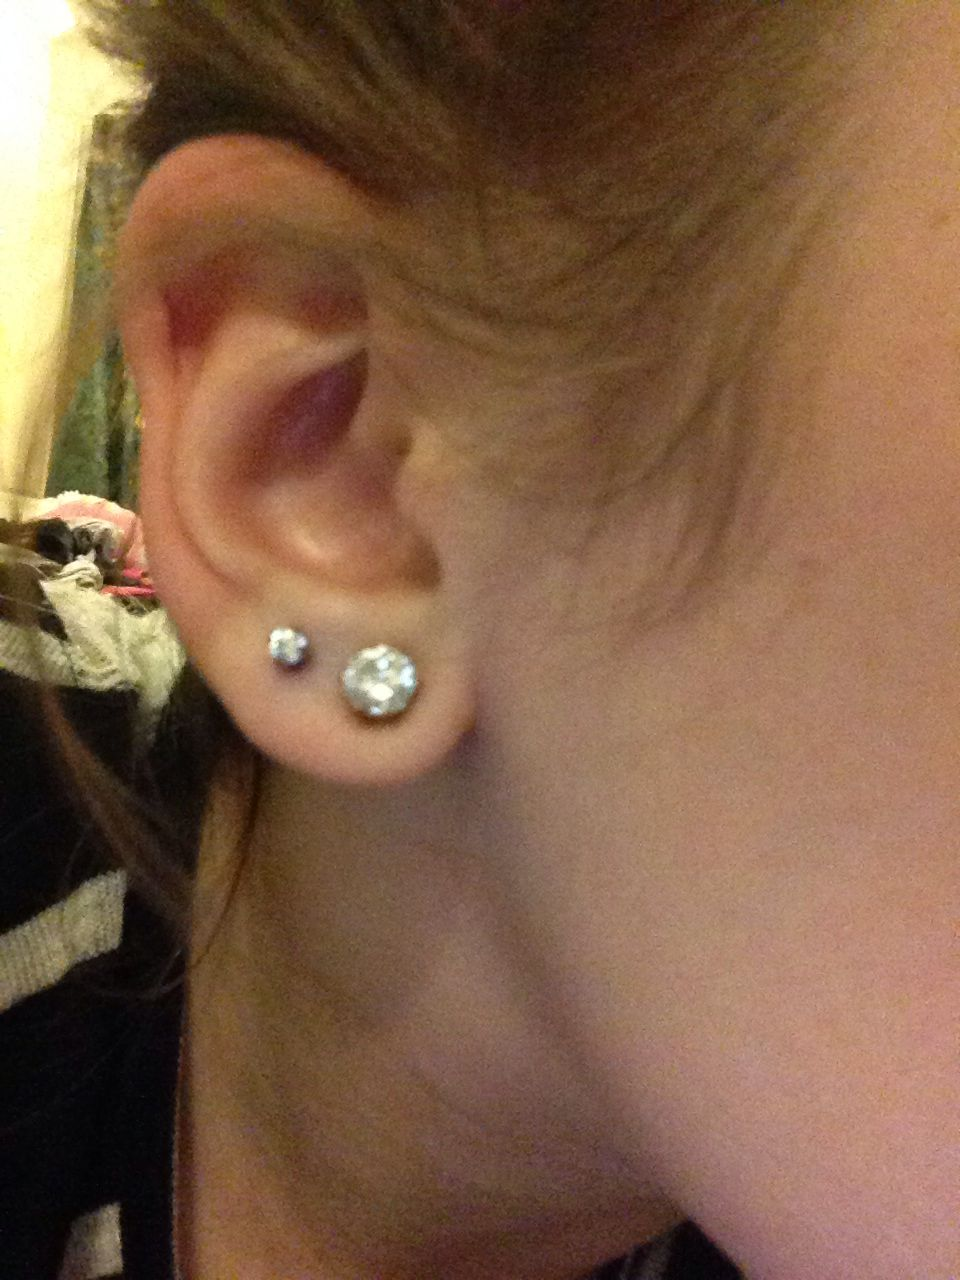 2 nose piercing  Got my second ear piercing  So cute  I kinda love things